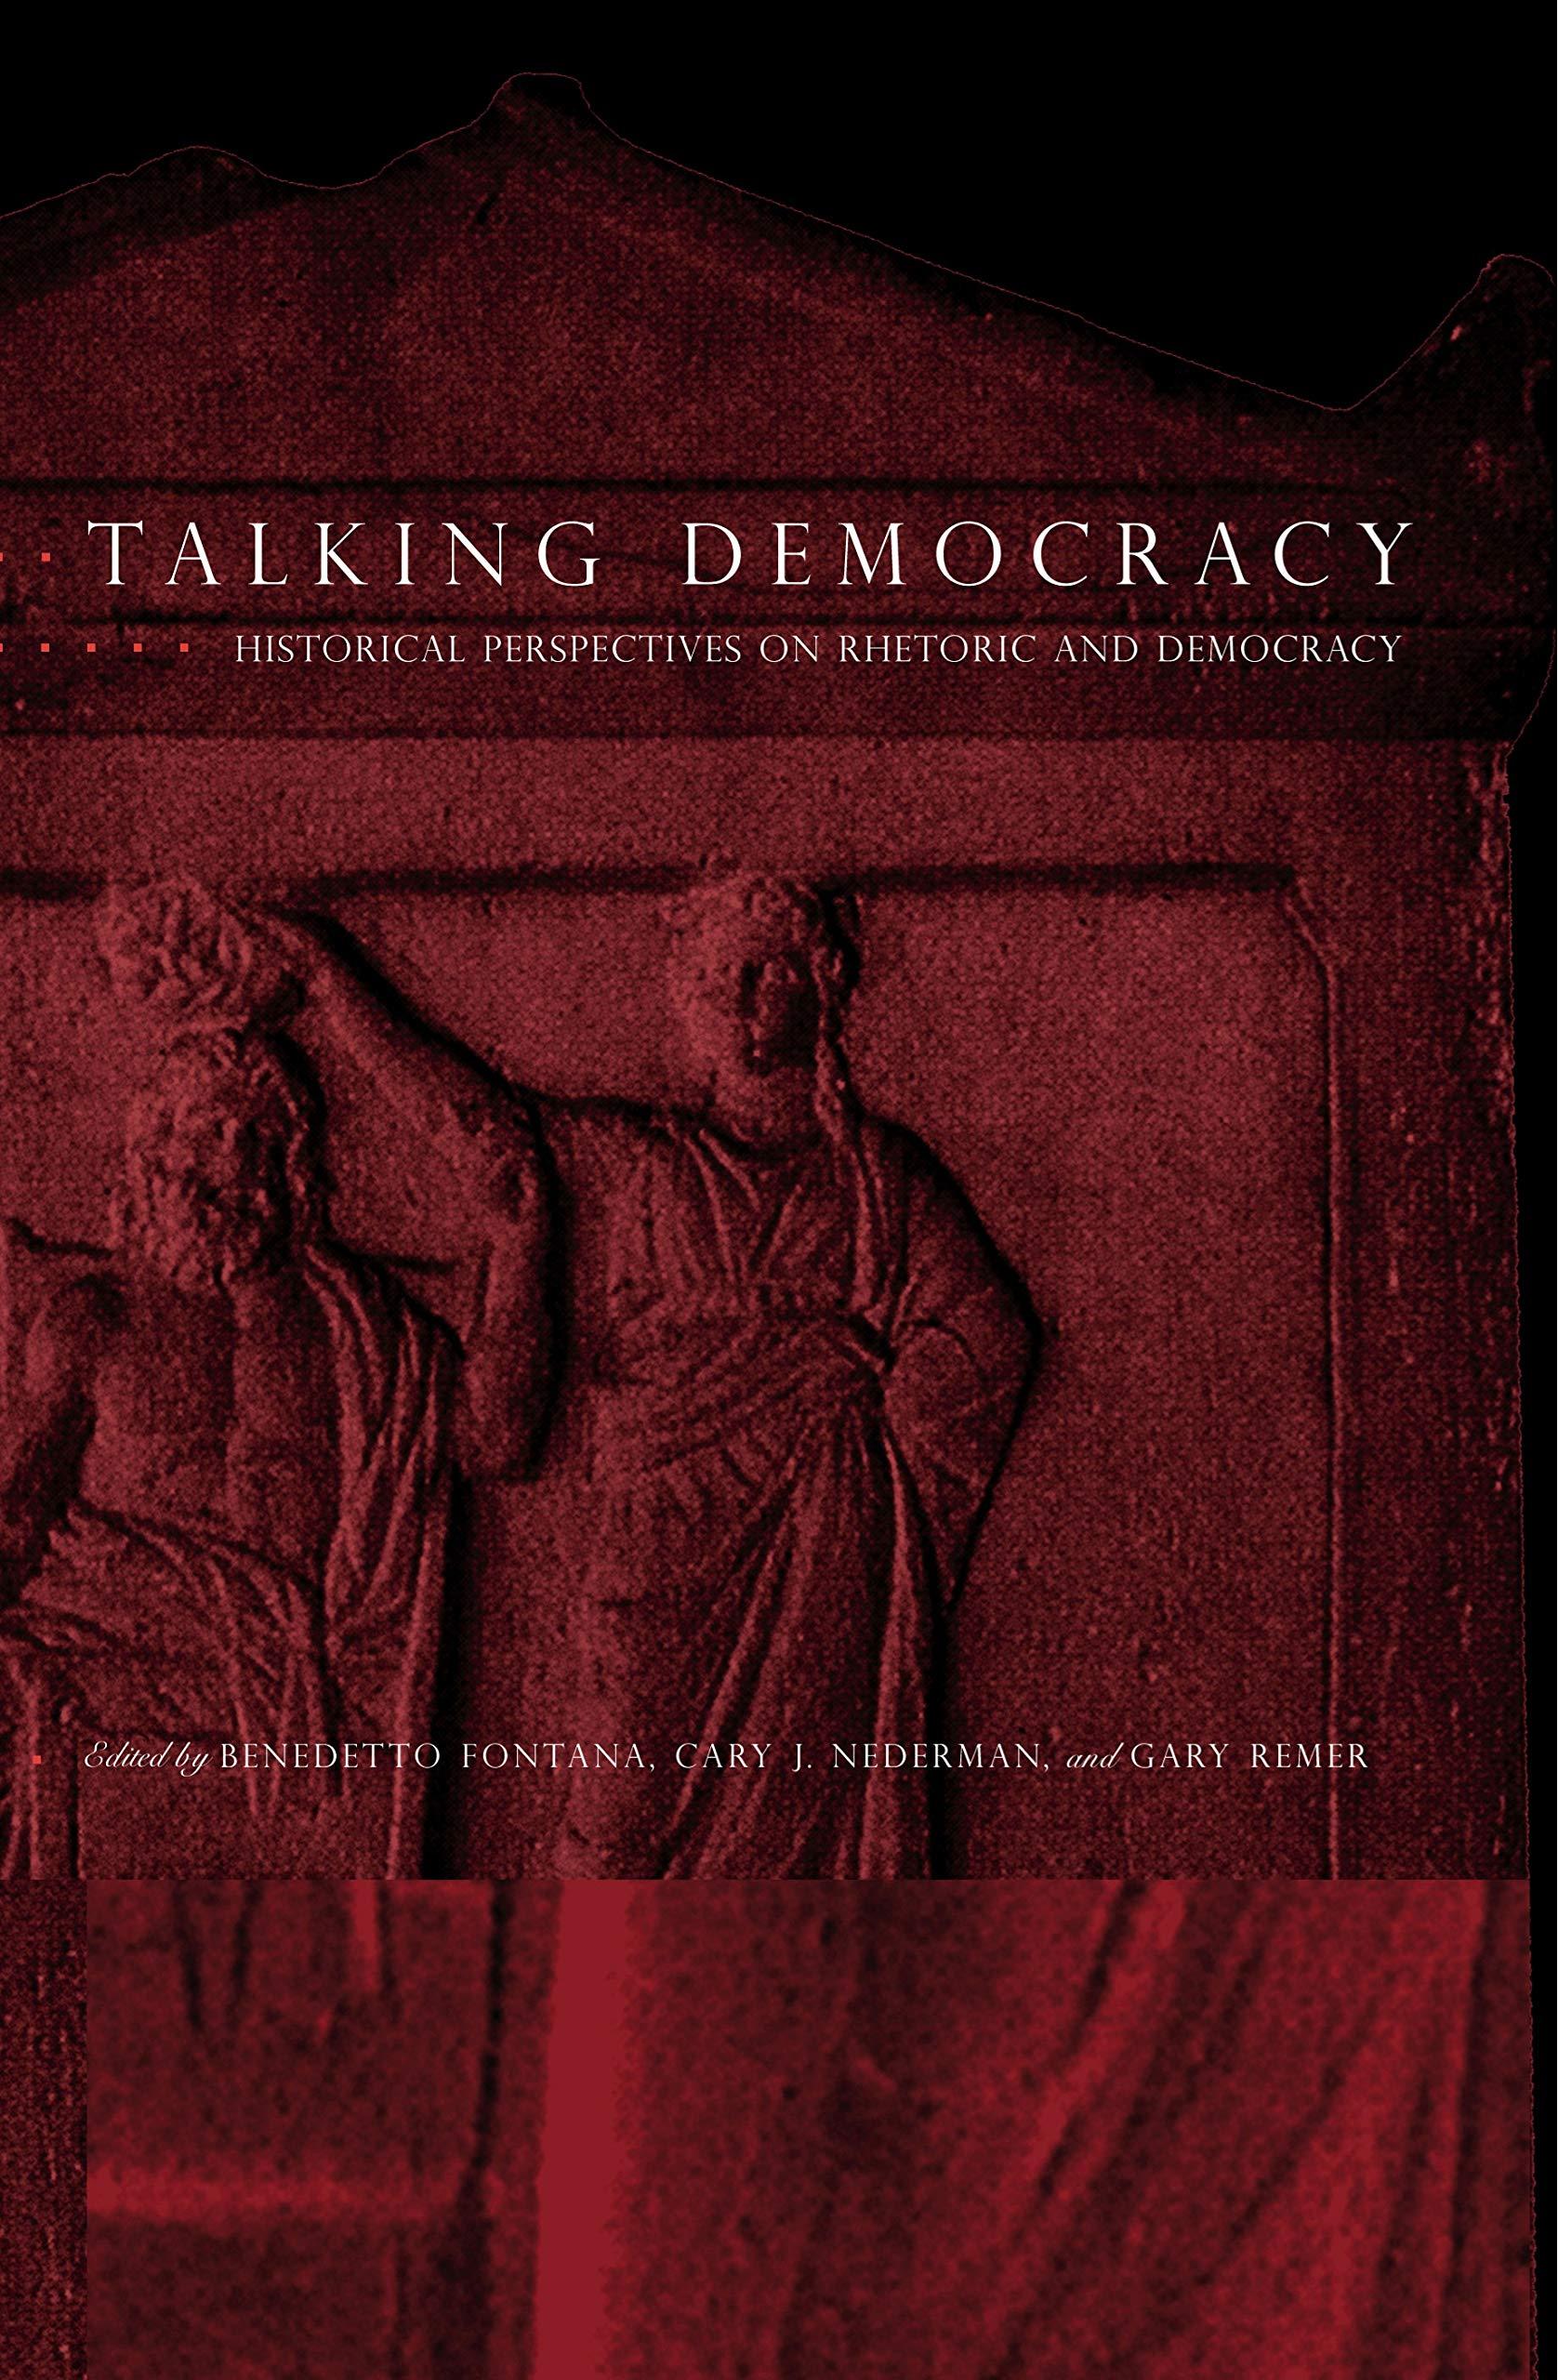 Talking Democracy: Historical Perspectives on Rhetoric and Democracy